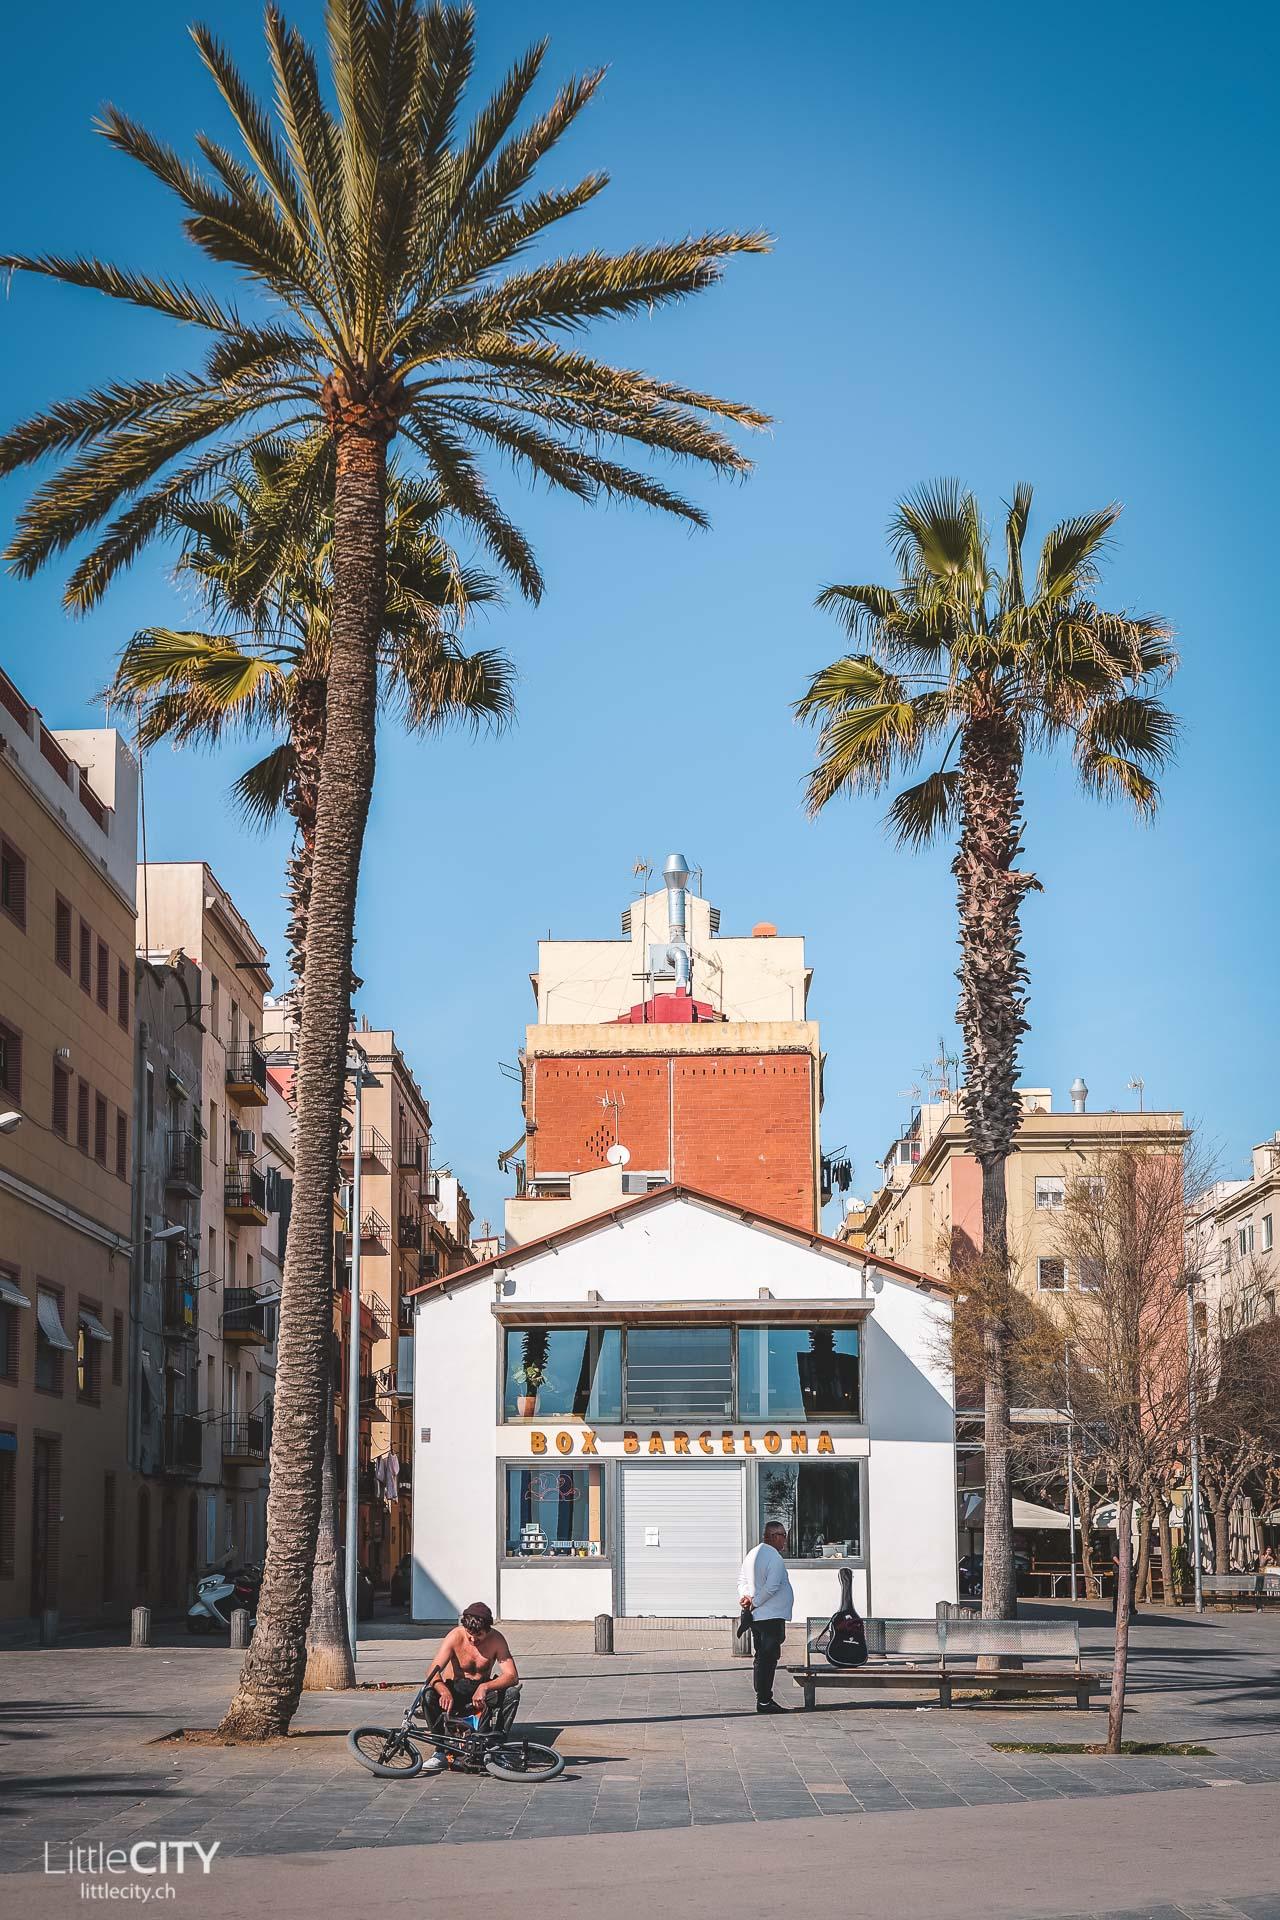 Barcelona Sehenswürdigkeiten Barceloneta